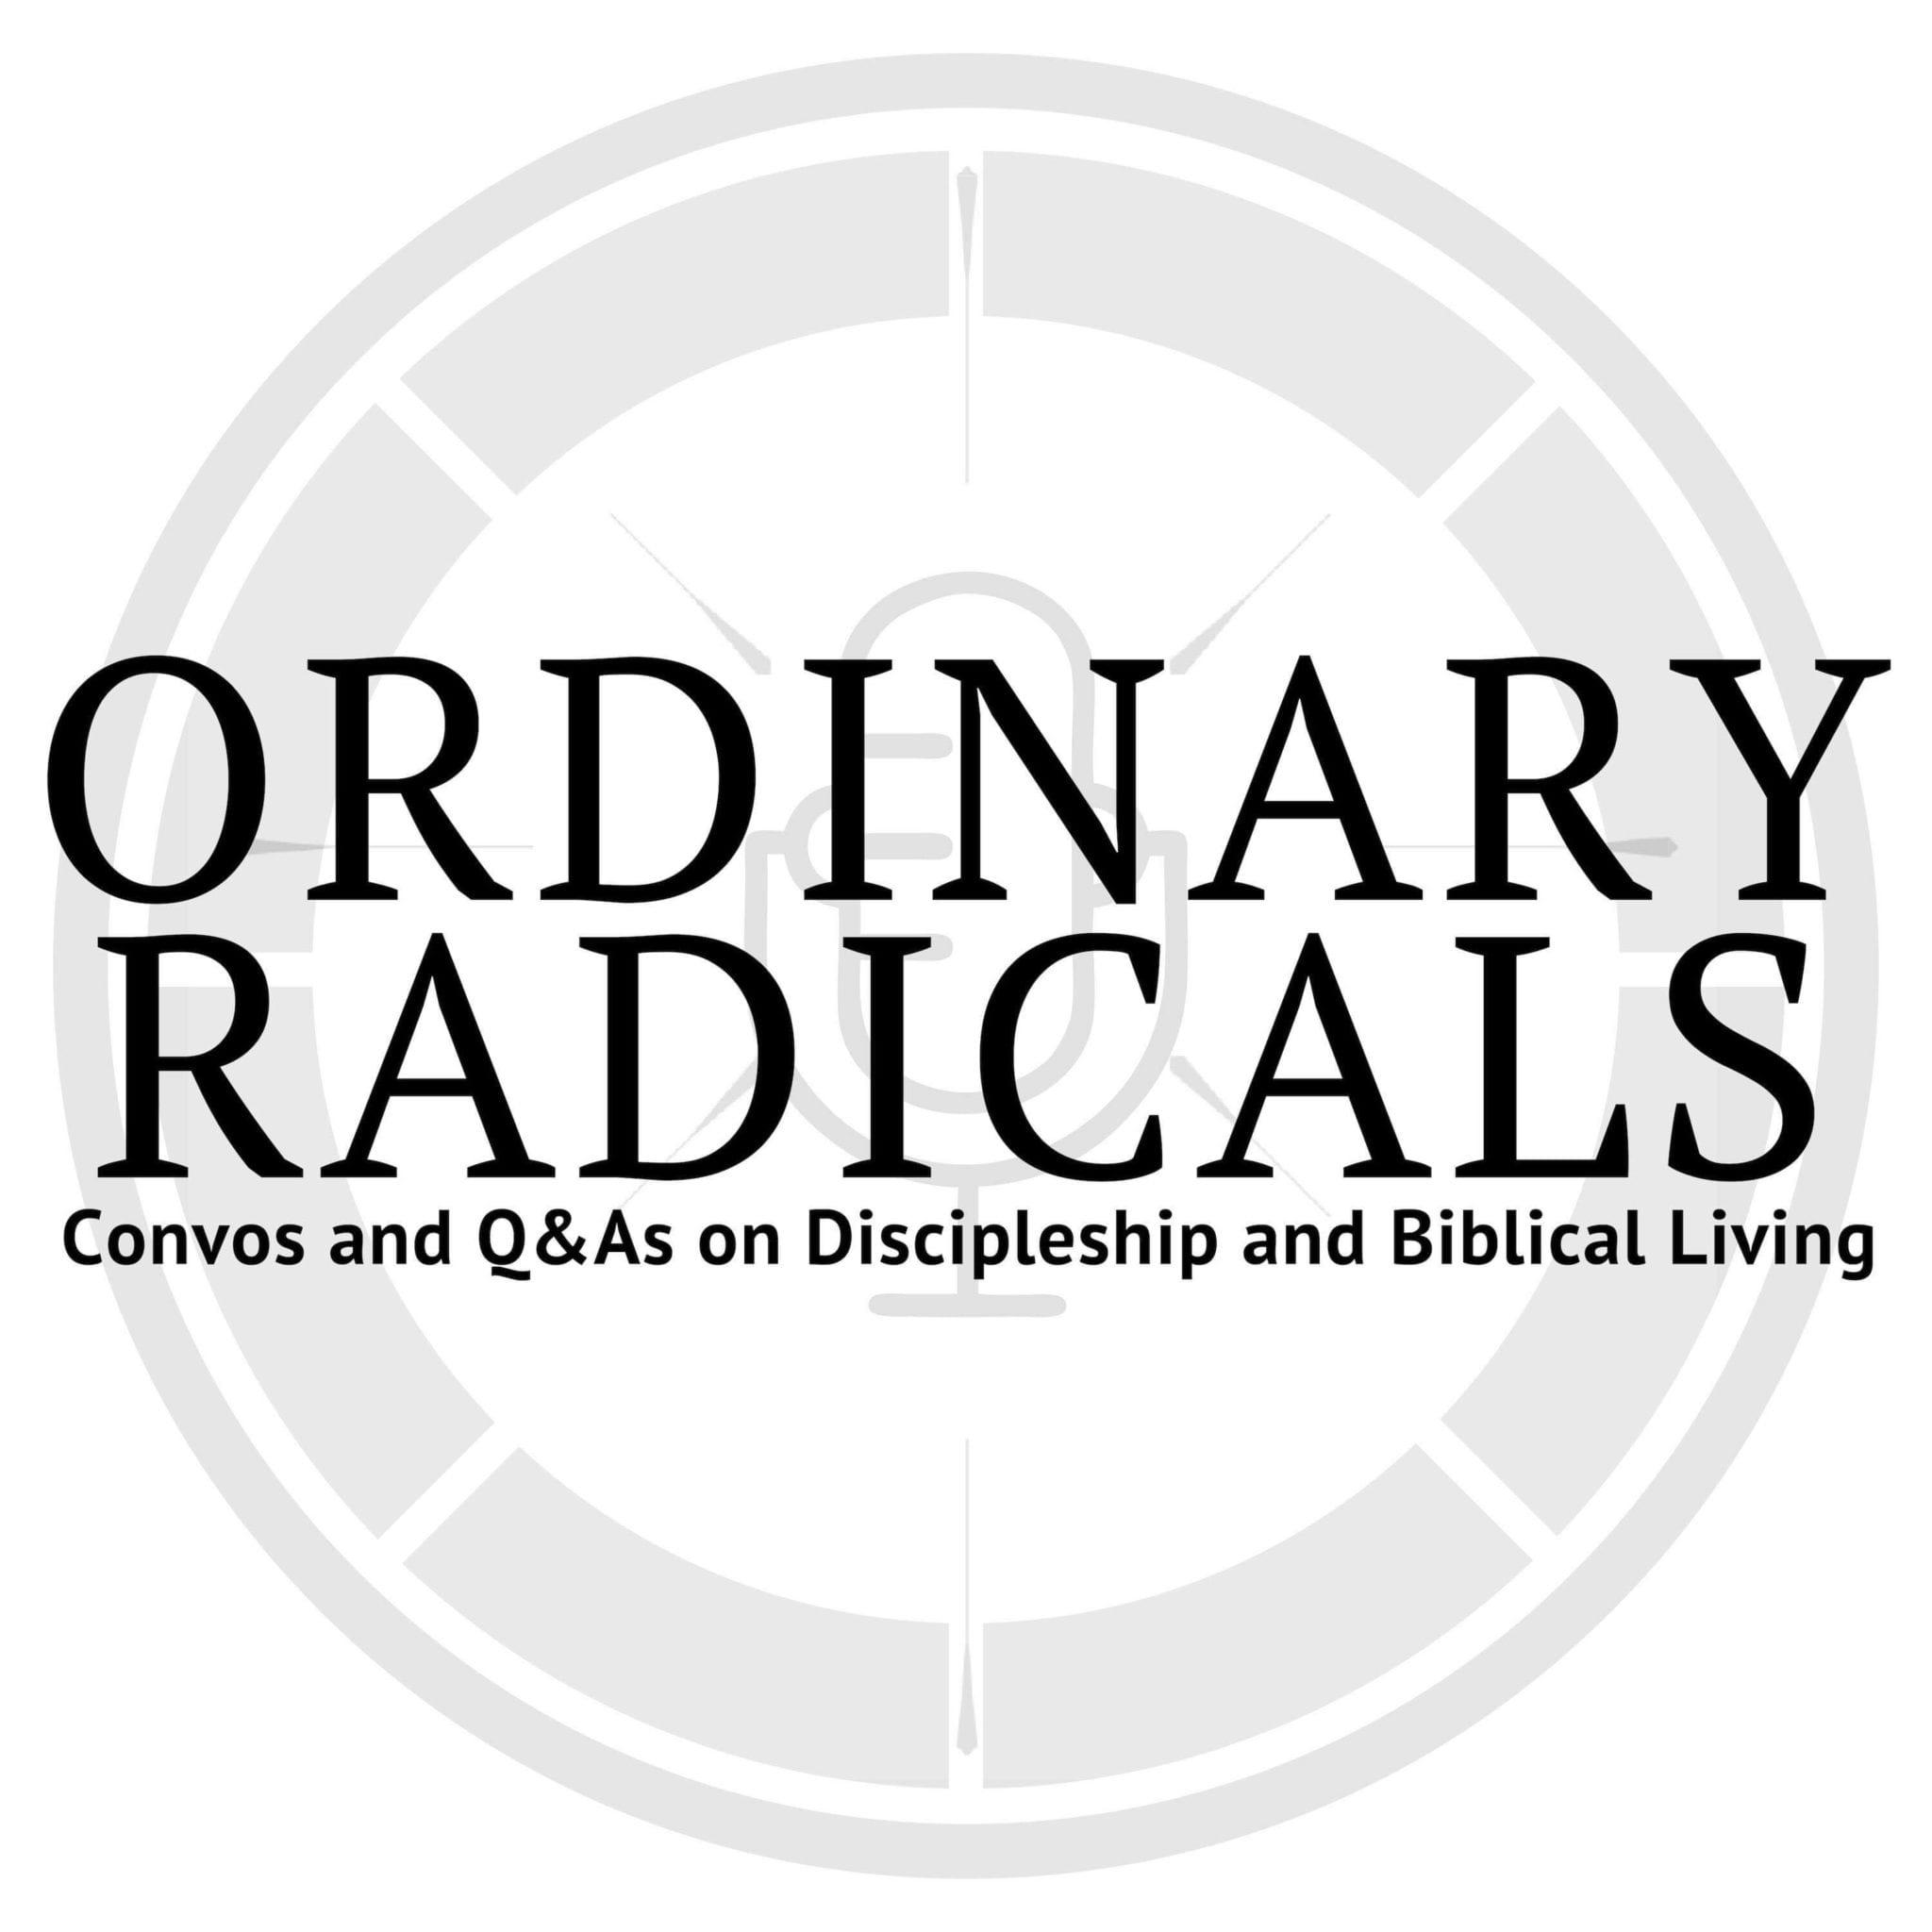 Ordinary Radicals